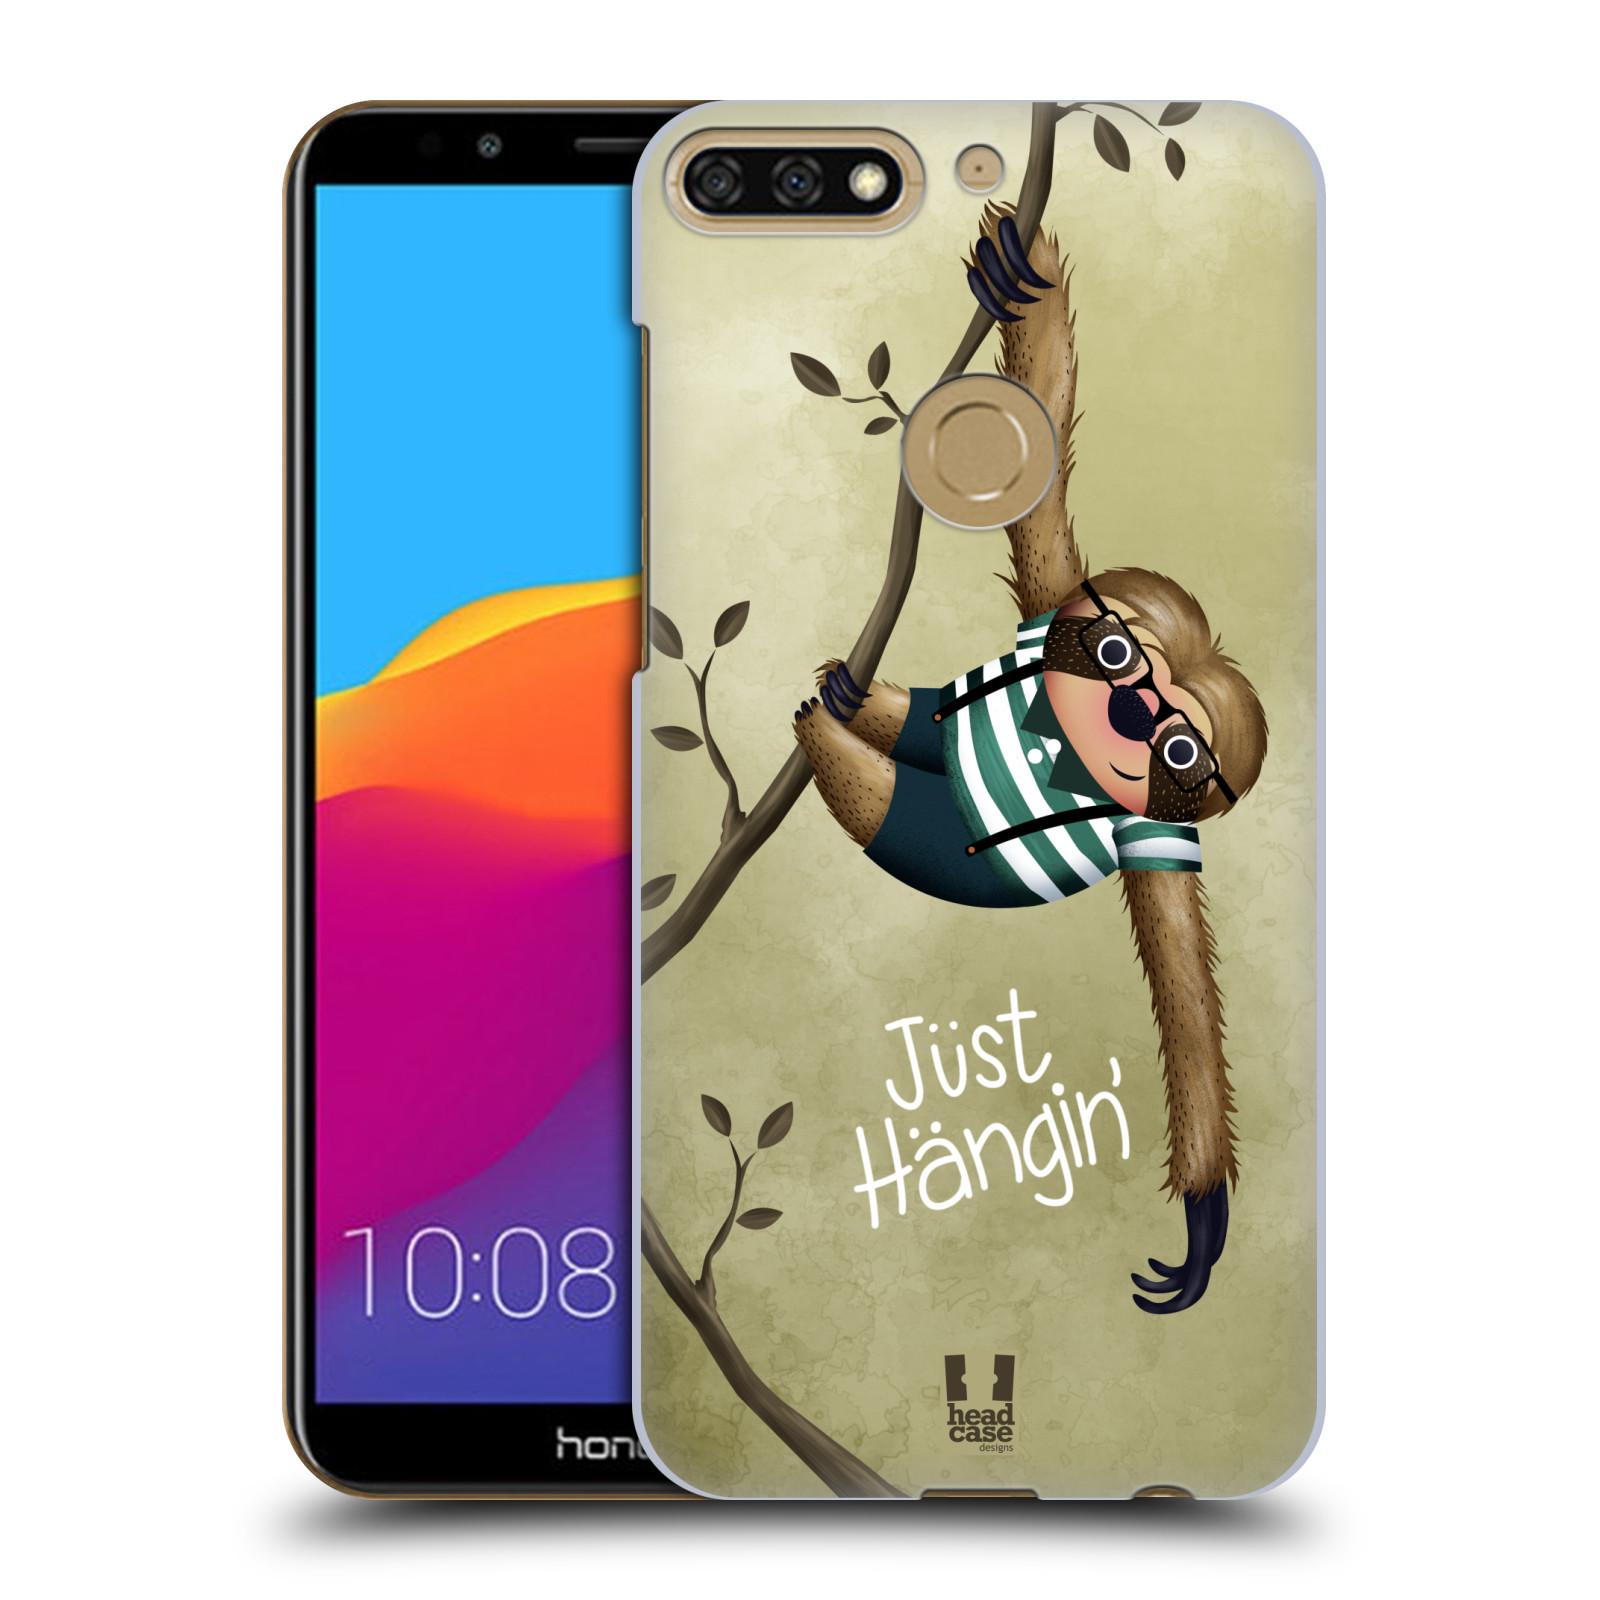 Plastové pouzdro na mobil Huawei Y7 Prime 2018 - Head Case - Lenochod Just Hangin